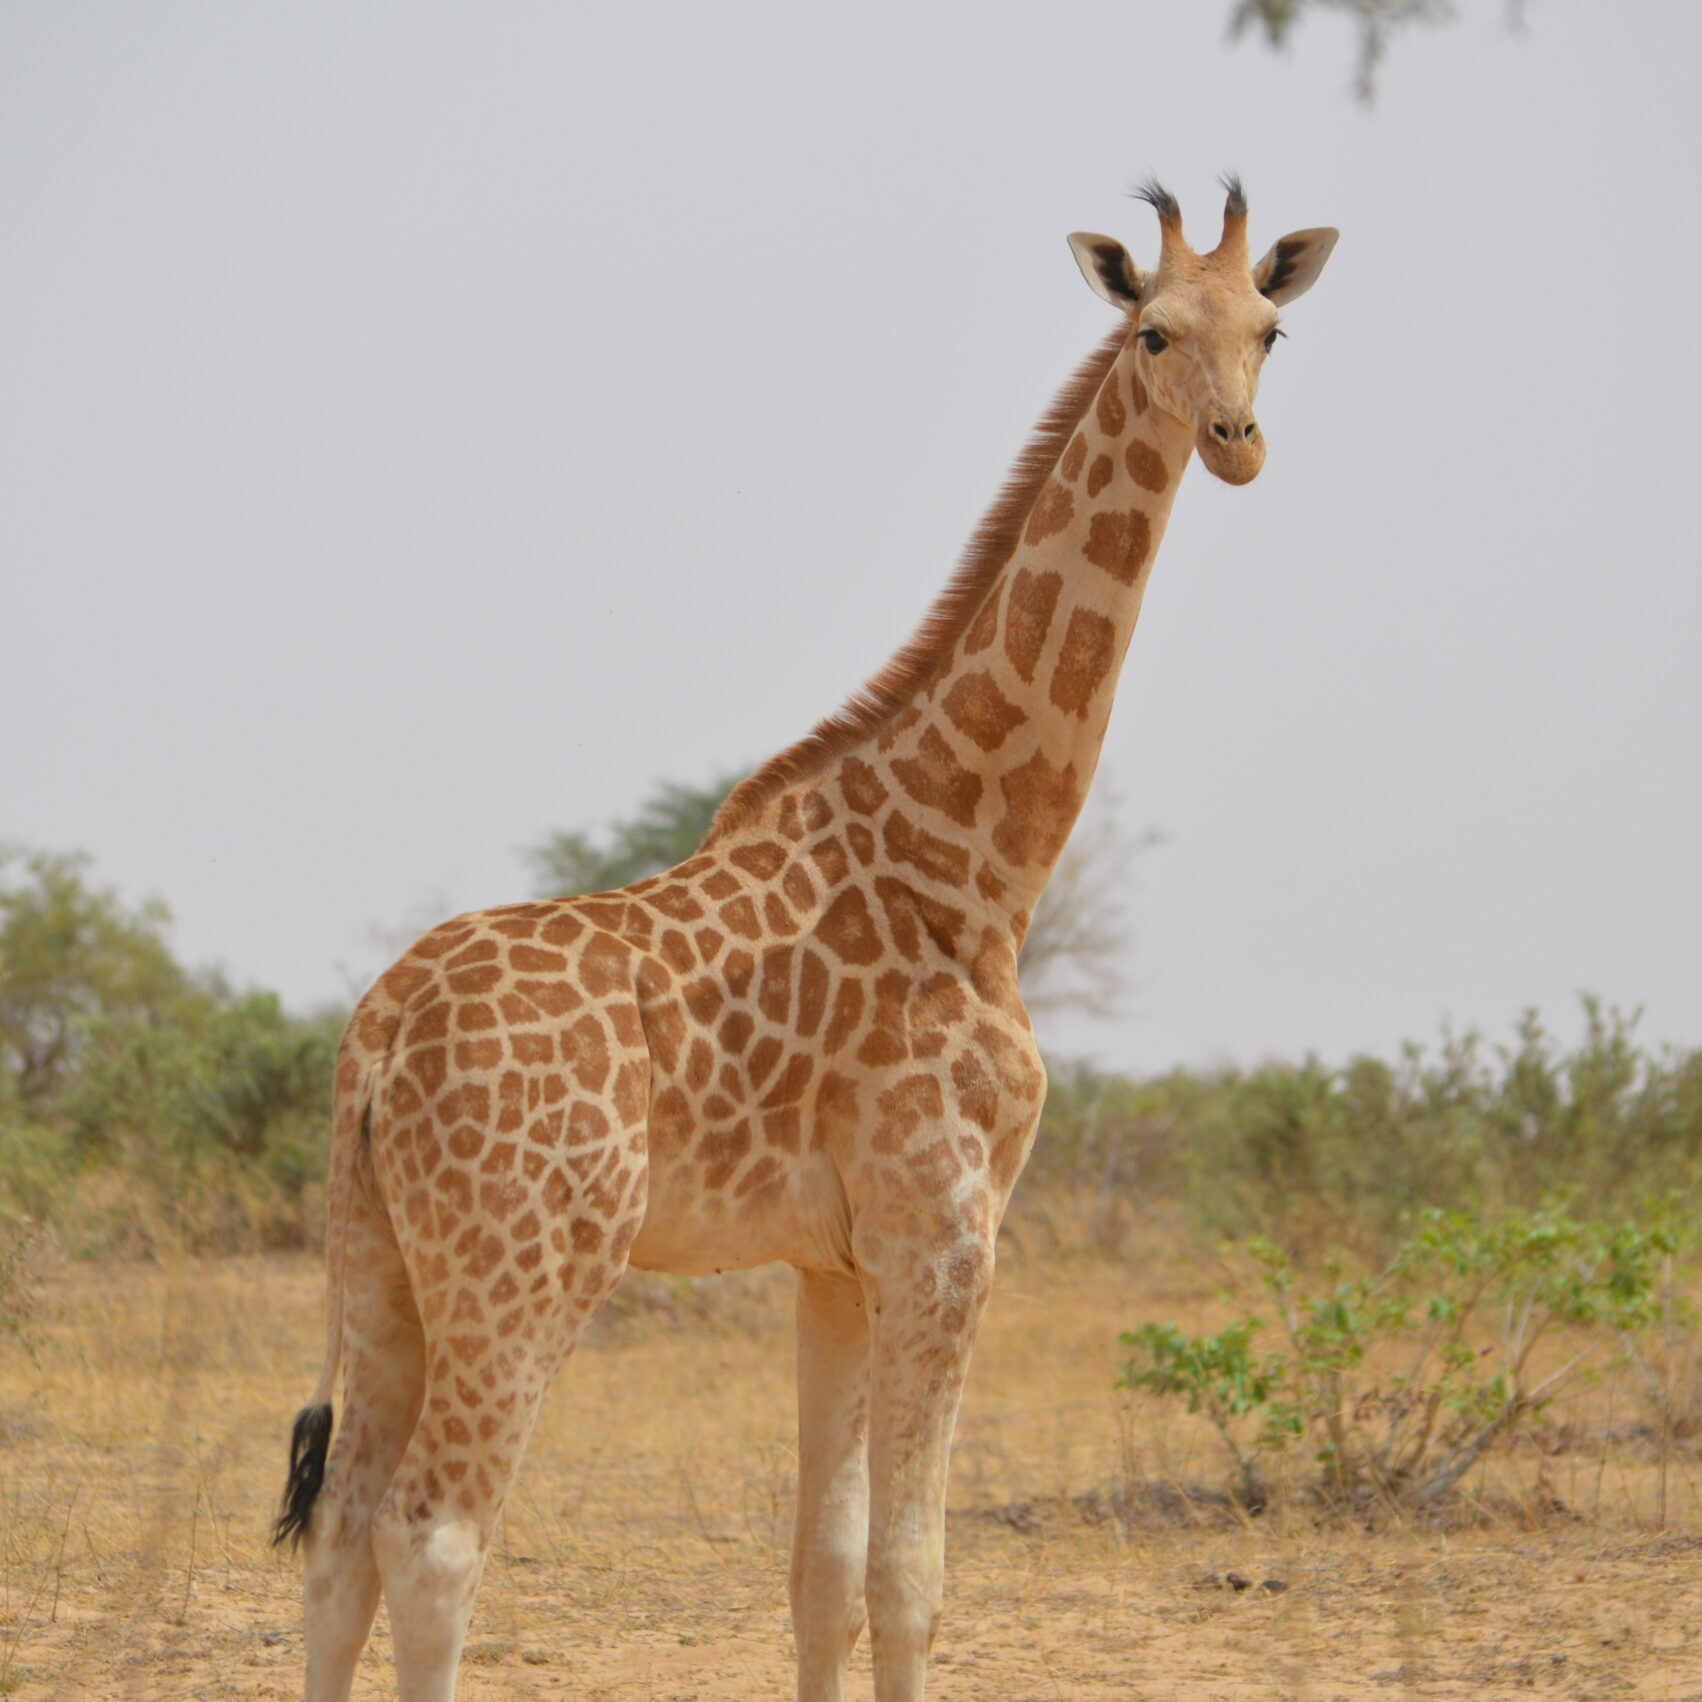 Young giraffe in Africa